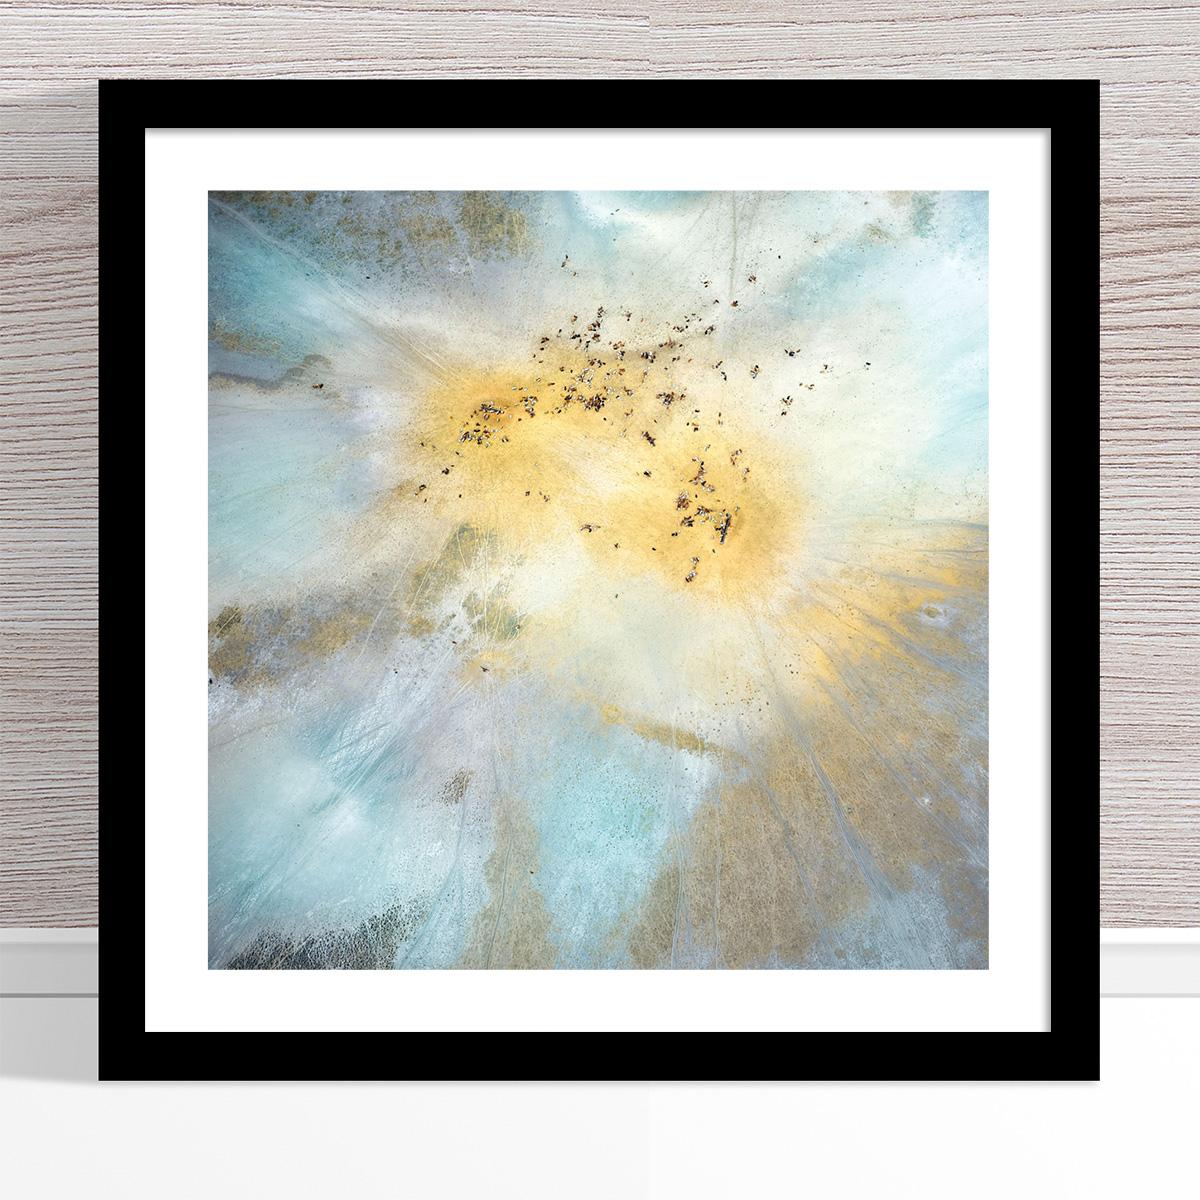 Chris Saunders - 'Aerial Outback 014' Black Frame